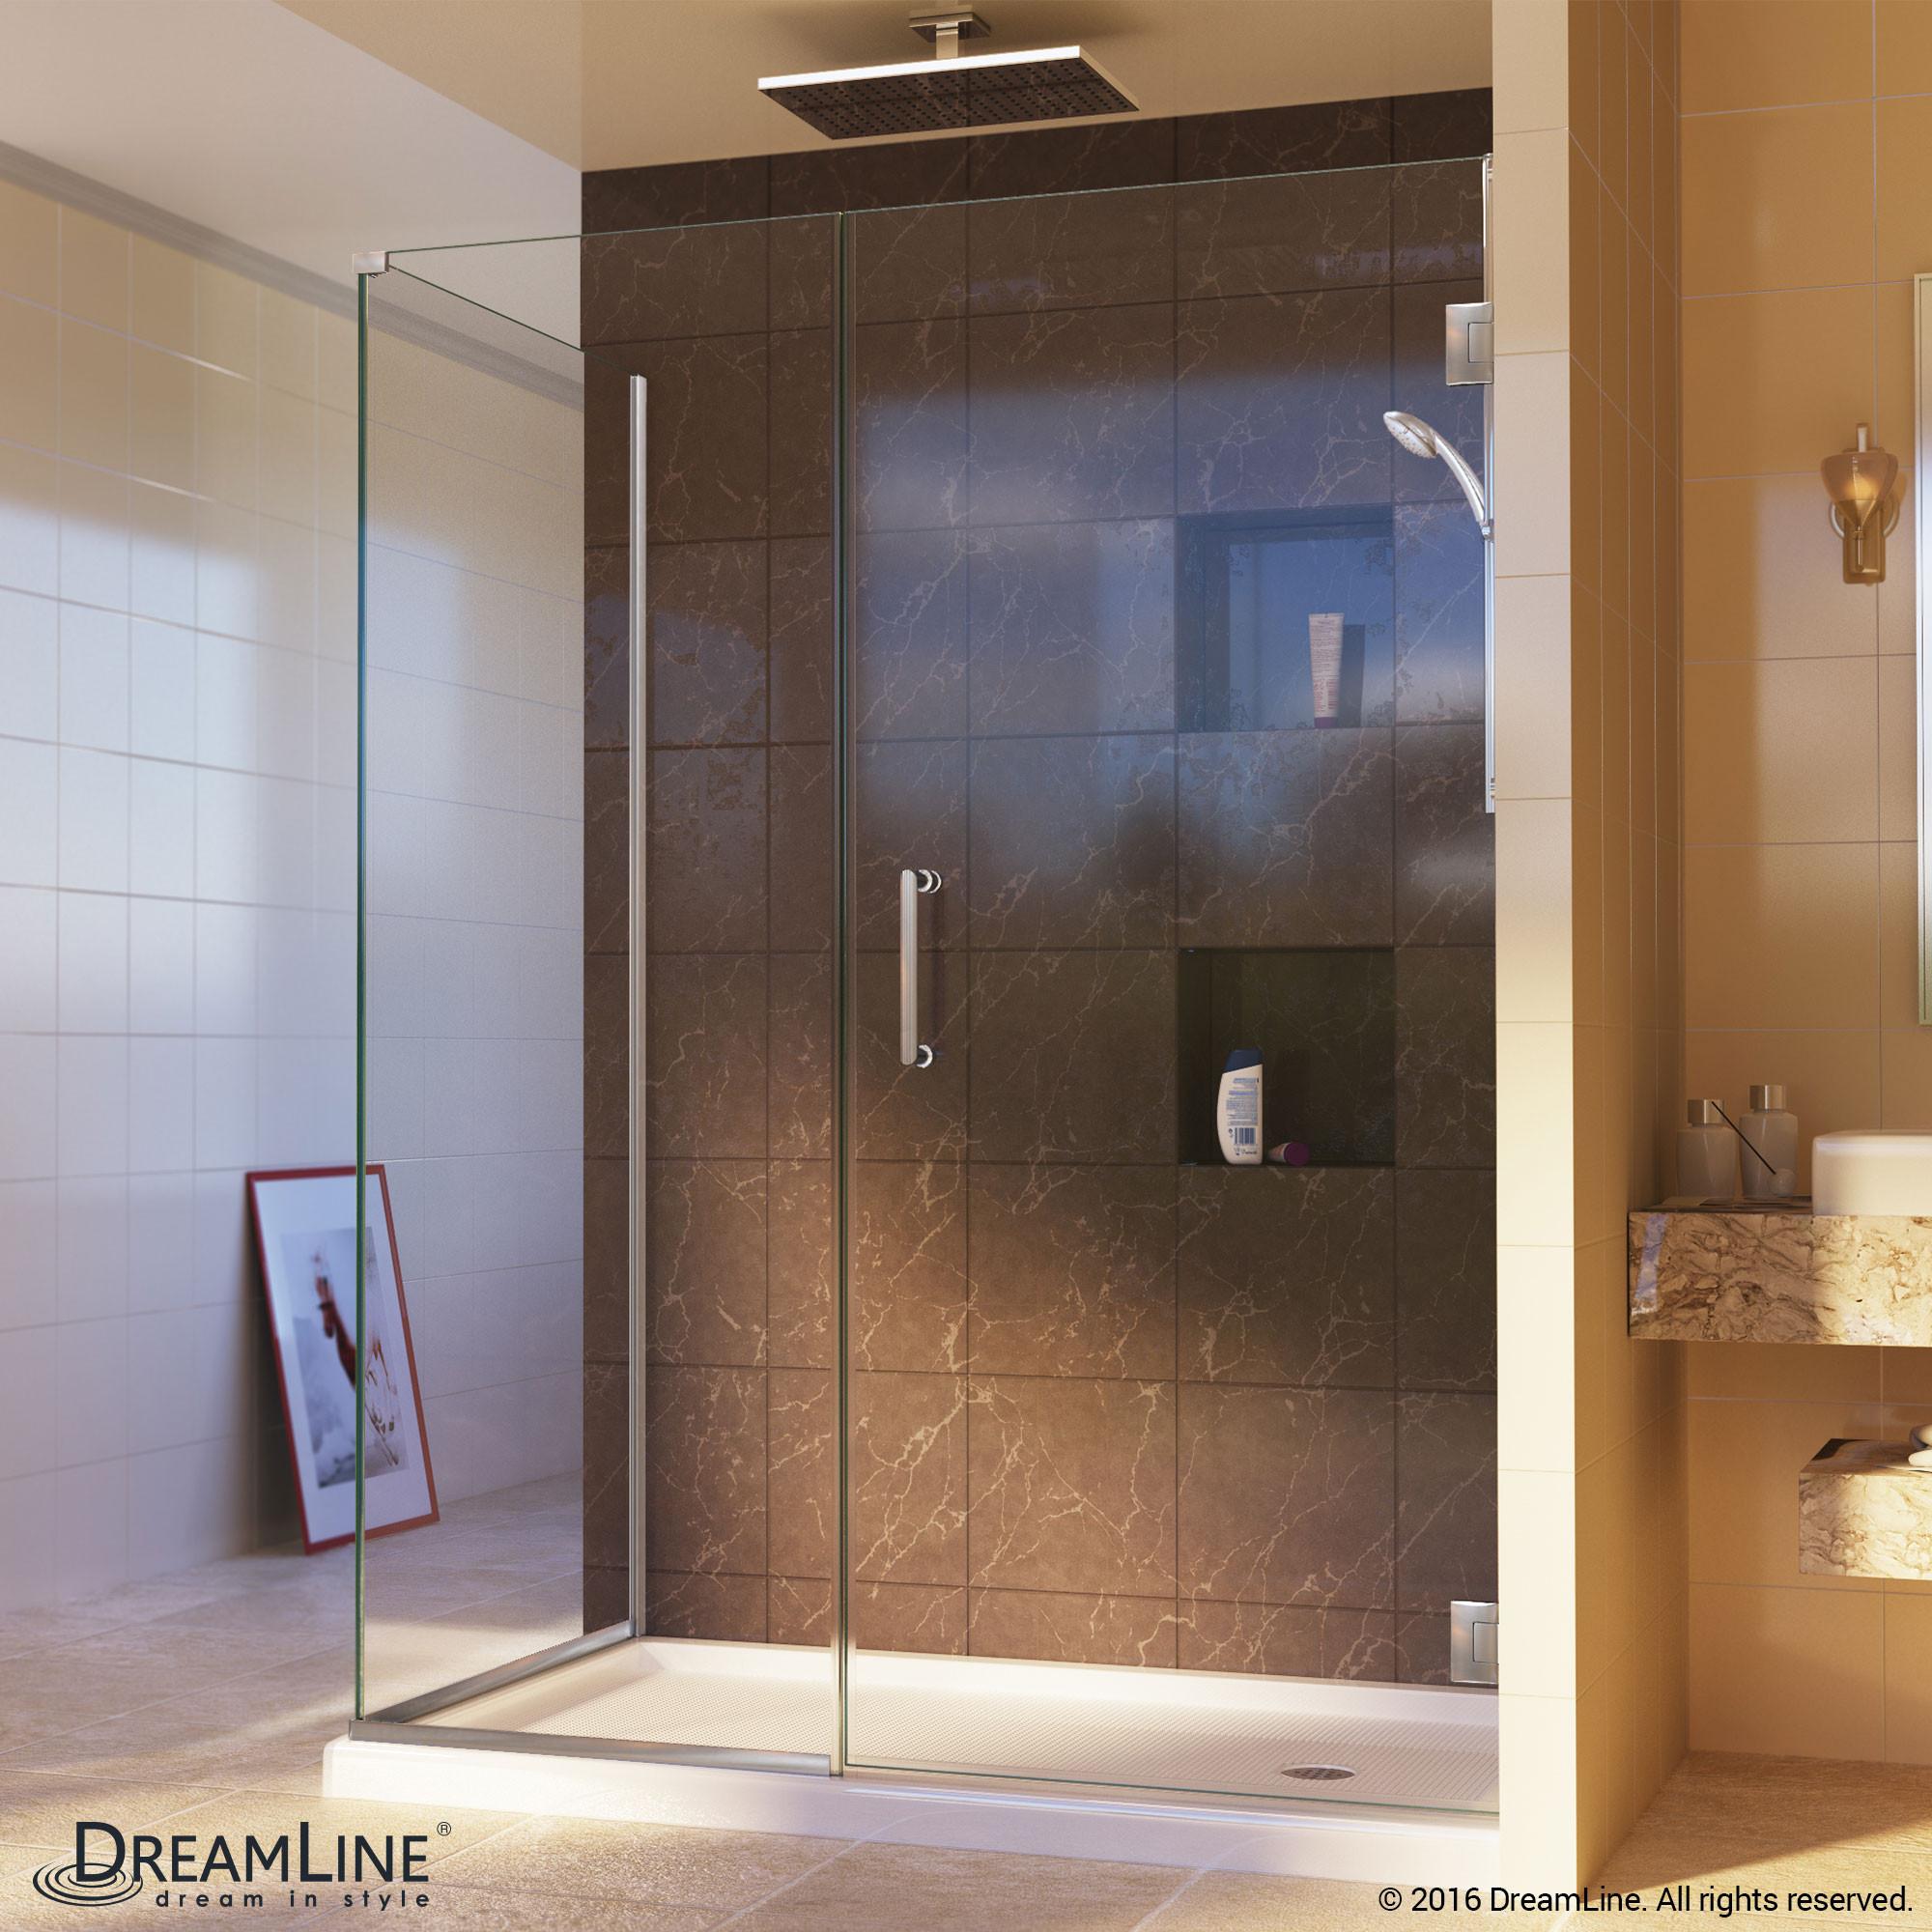 DreamLine SHEN-24575300-04 Unidoor Plus Hinged Shower Enclosure In Brushed Nickel Finish Hardware